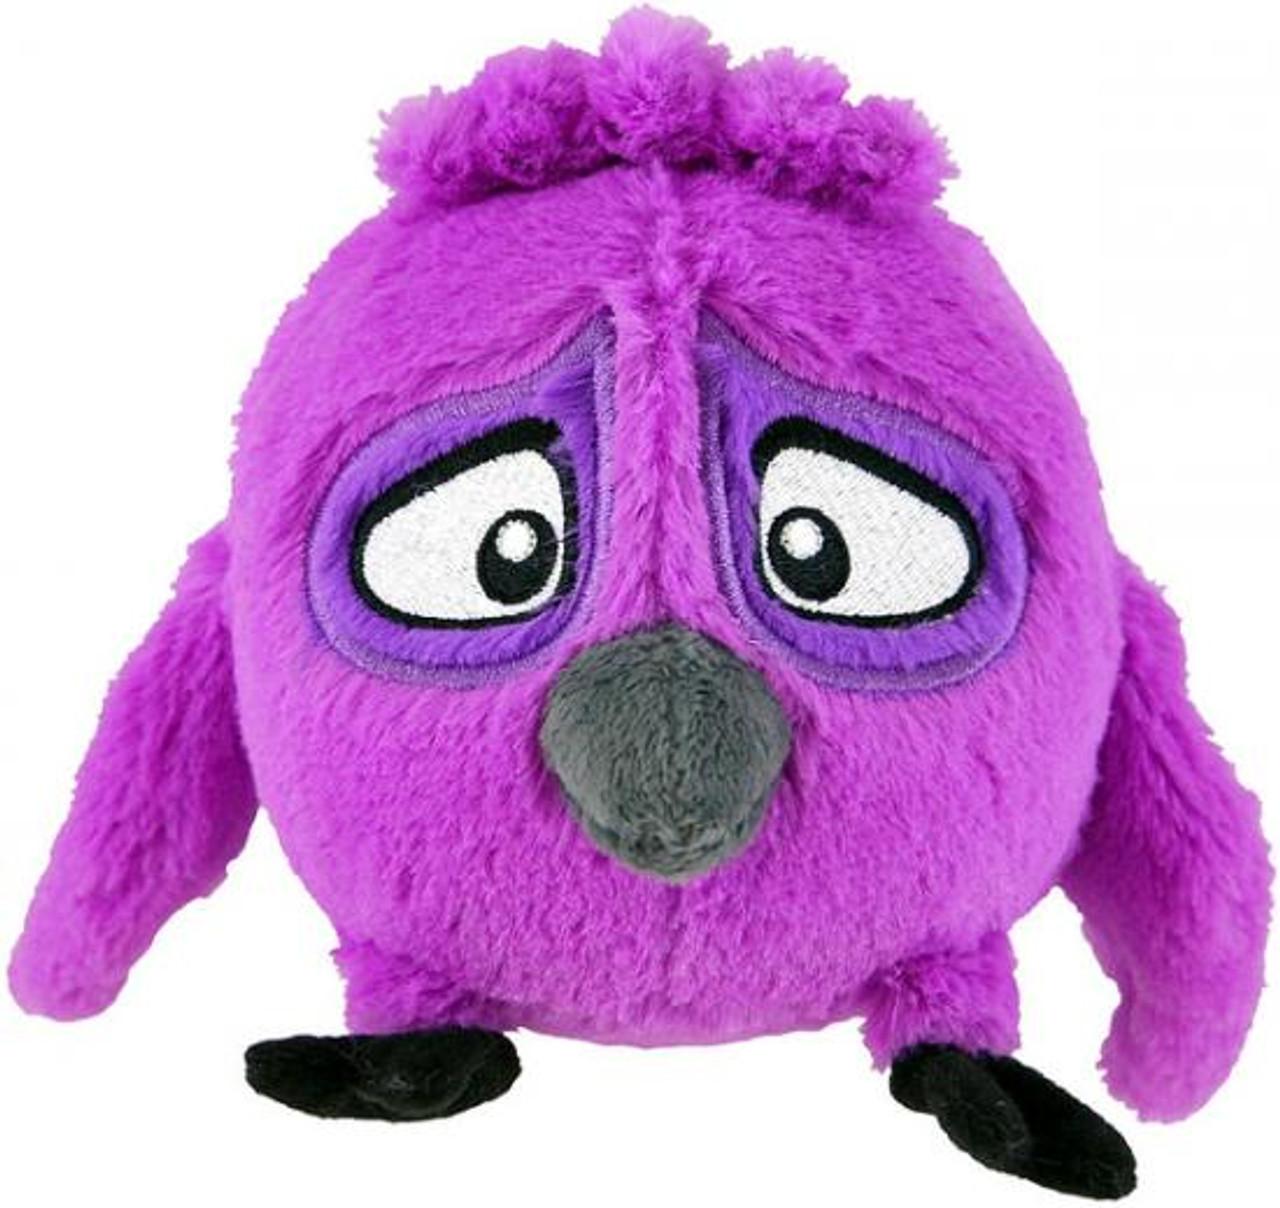 Angry Birds Rio Purple 5-Inch Plush [Talking]